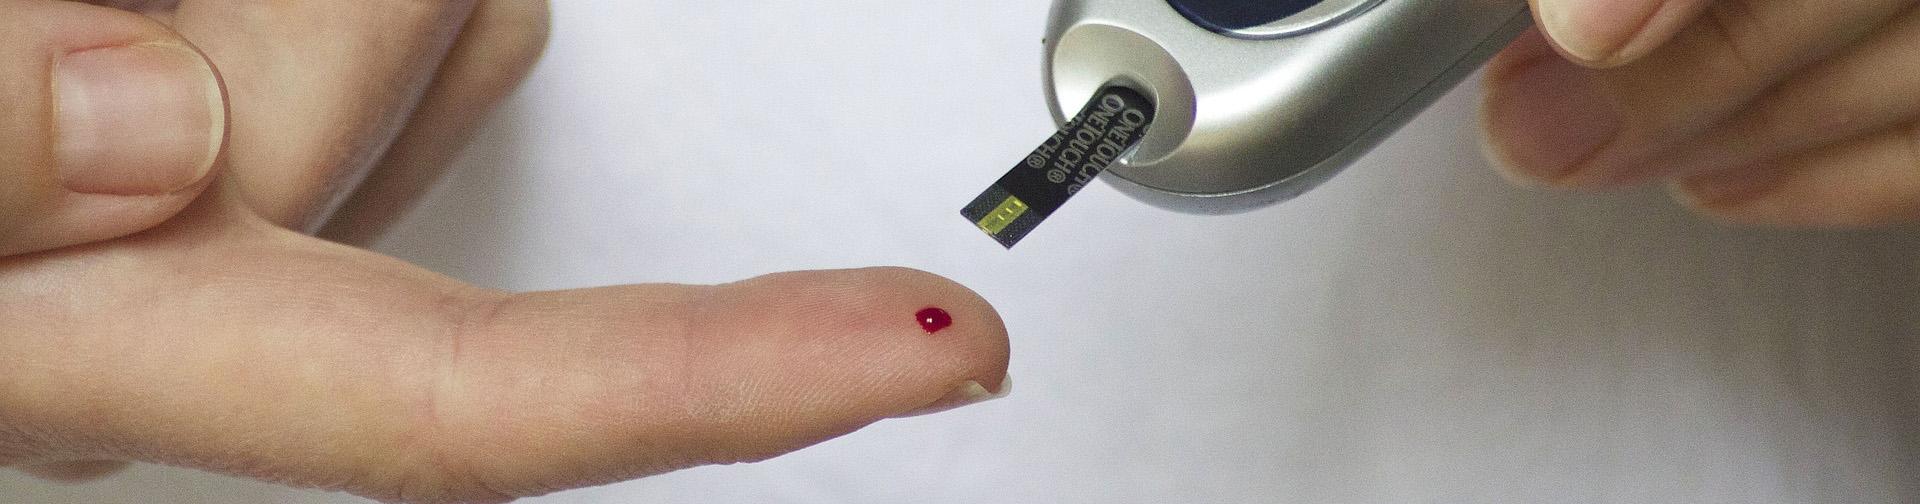 Diabetes Tester